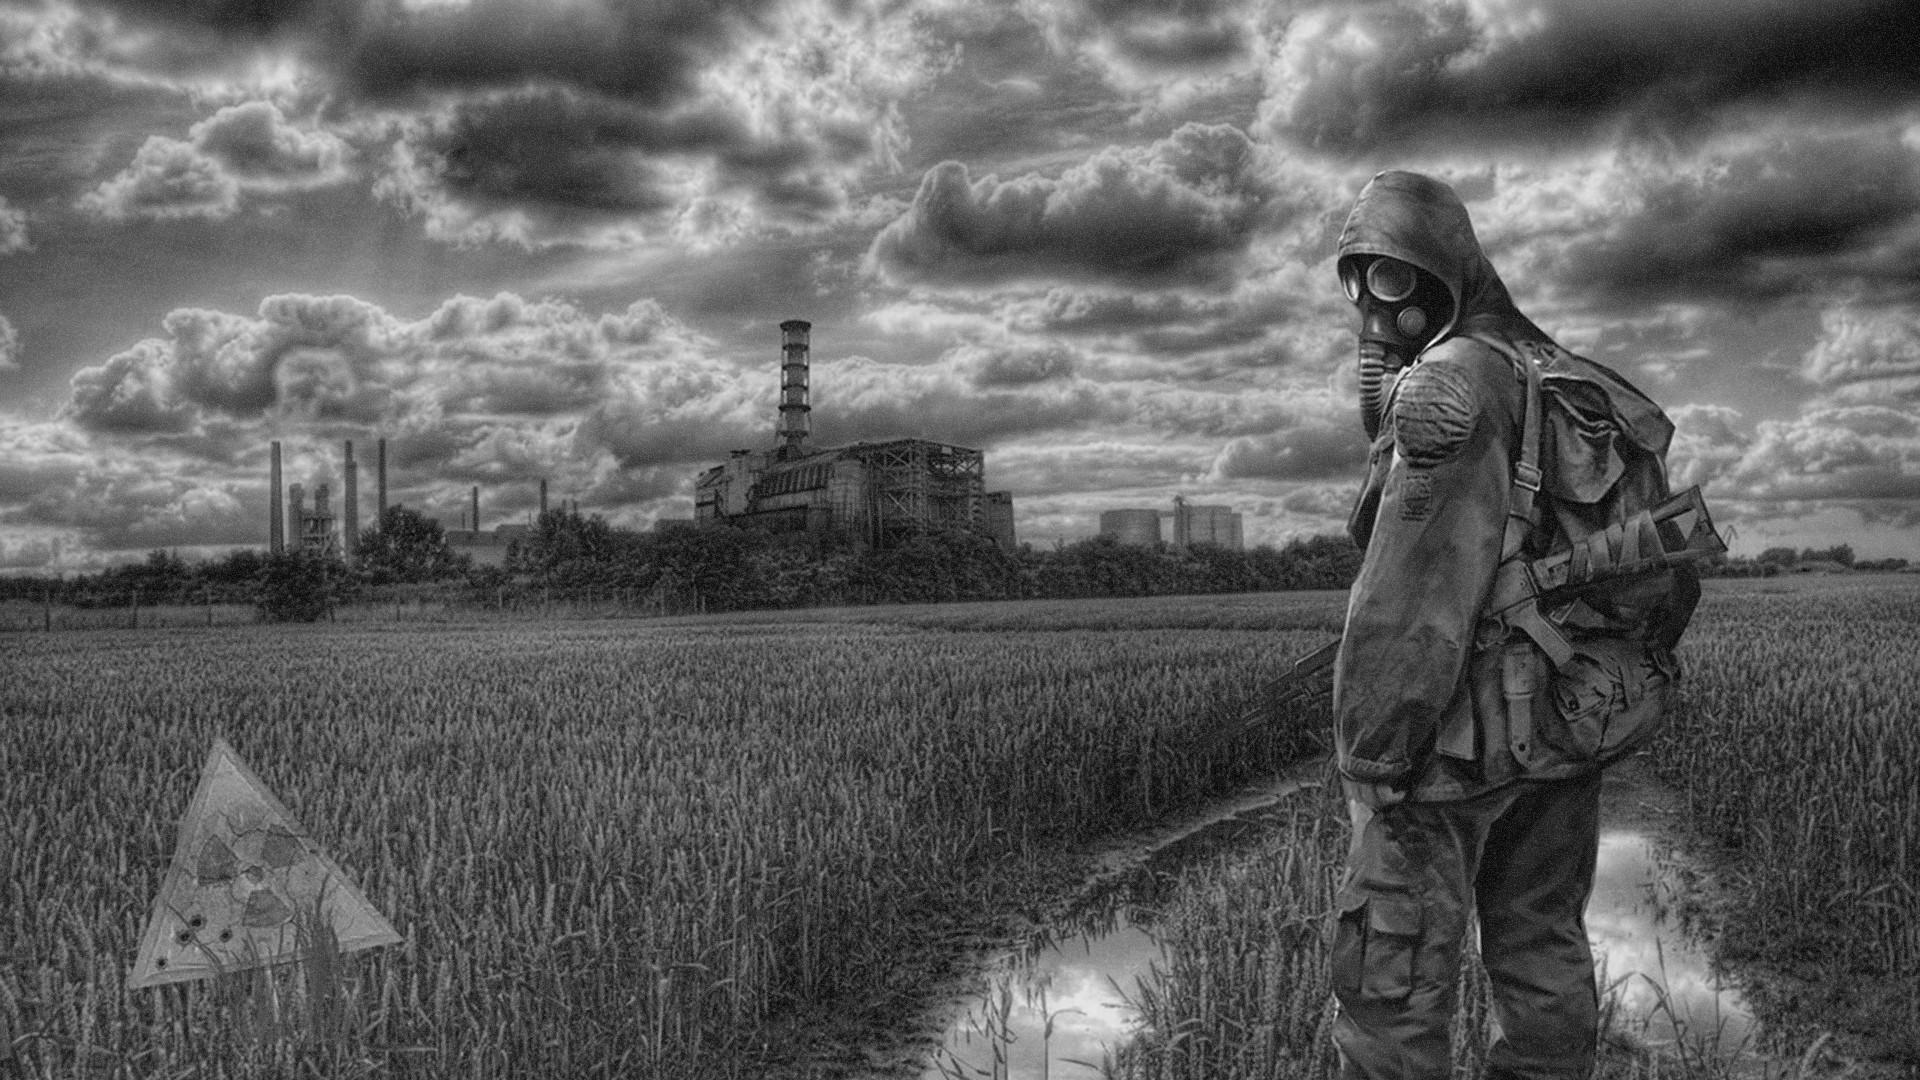 Stalker shadow of chernobyl wallpaper 1920x1080 81 images - Stalker wallpaper hd ...